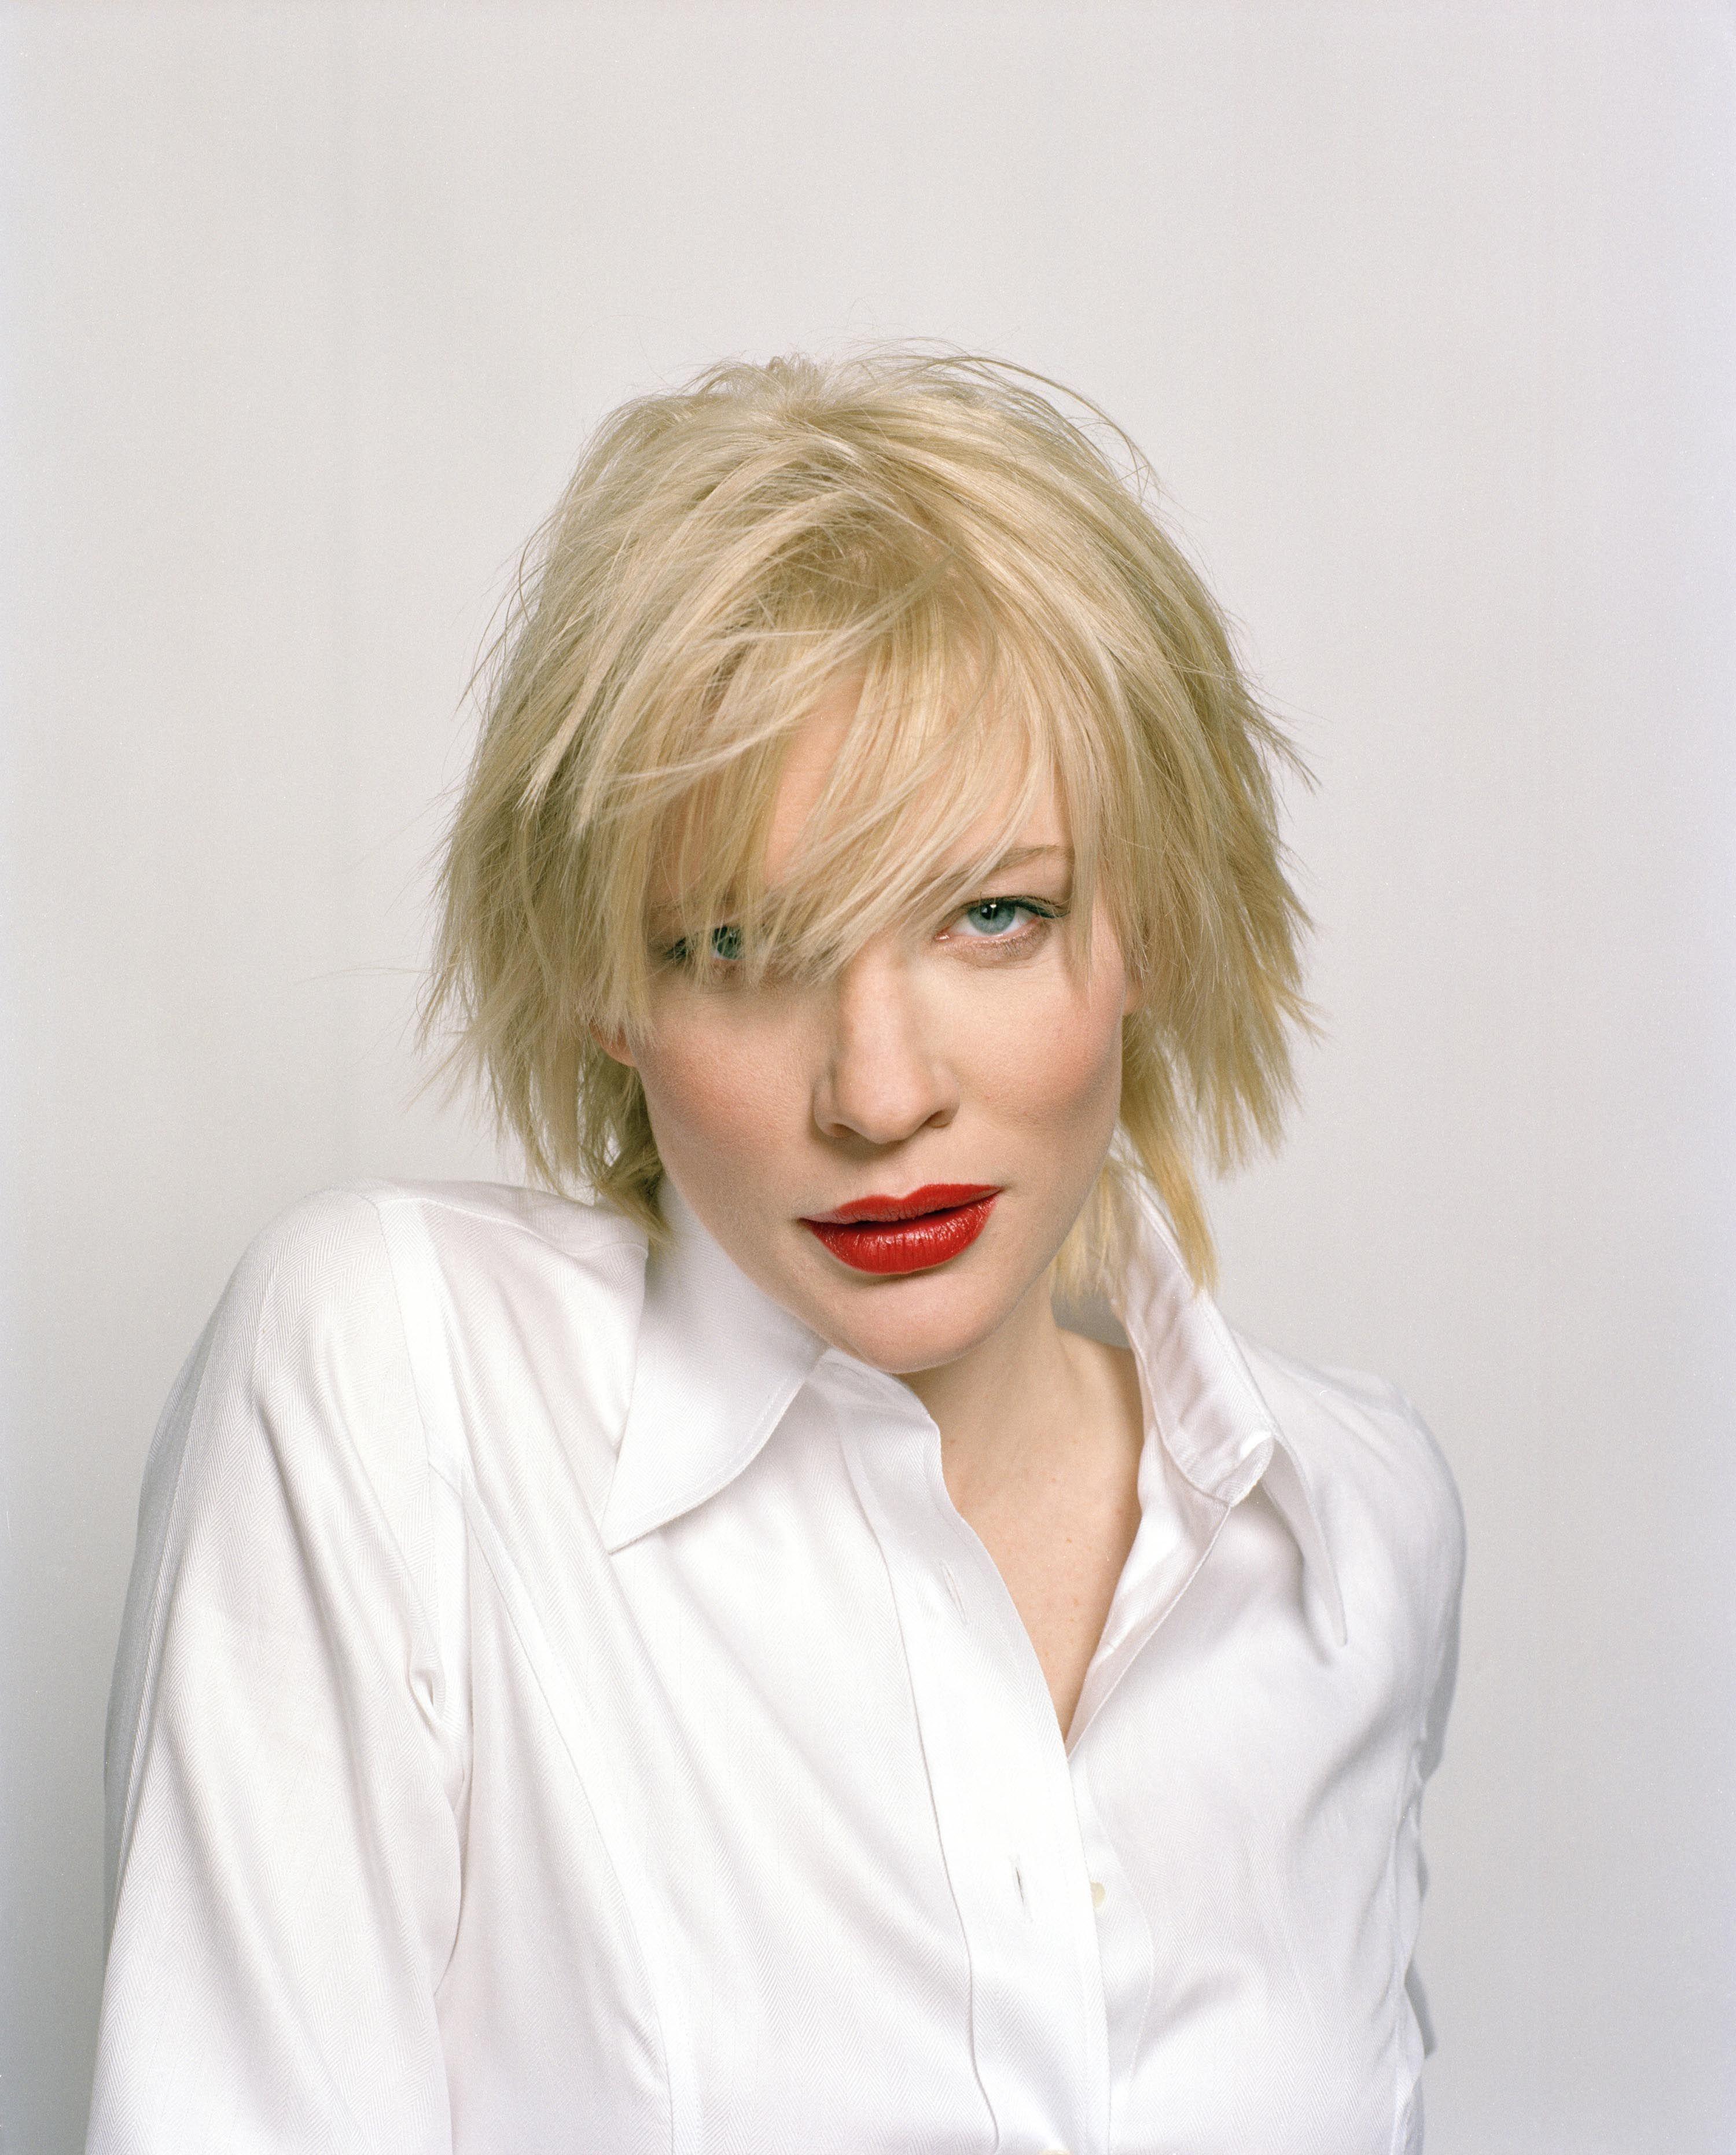 Cate Blanchett - Frank Bauer Photoshoot | Celebrities ...